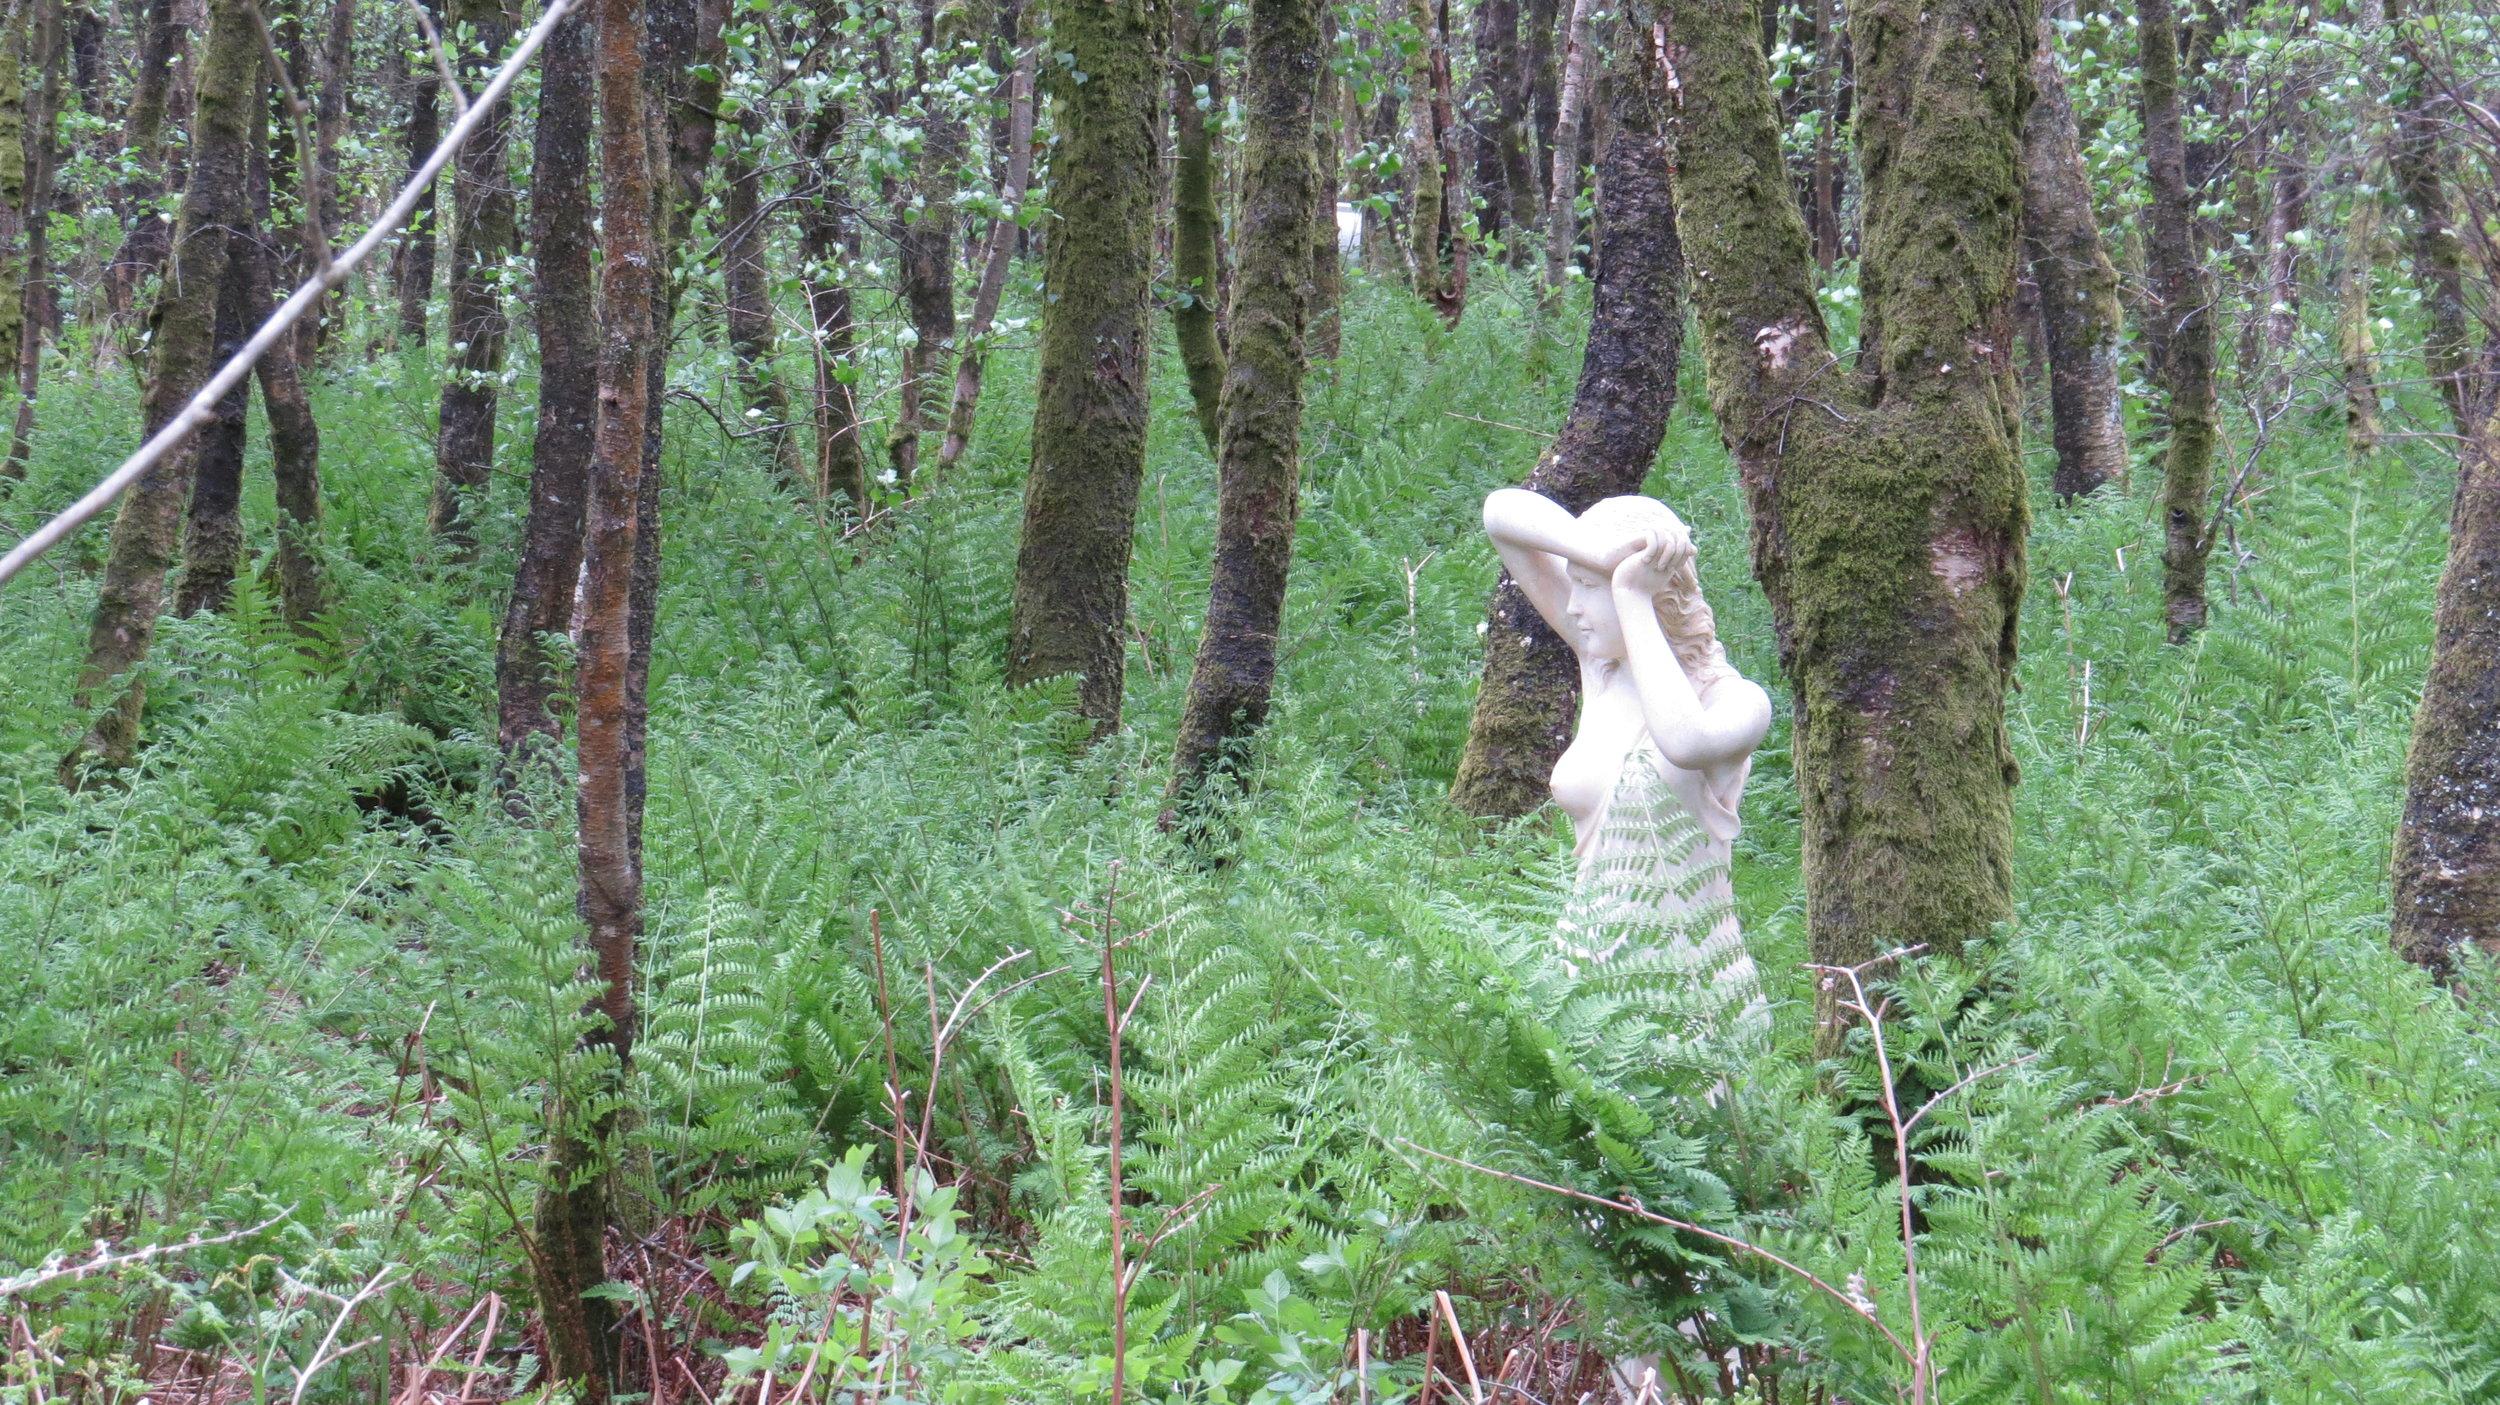 Random Statue in Woodland